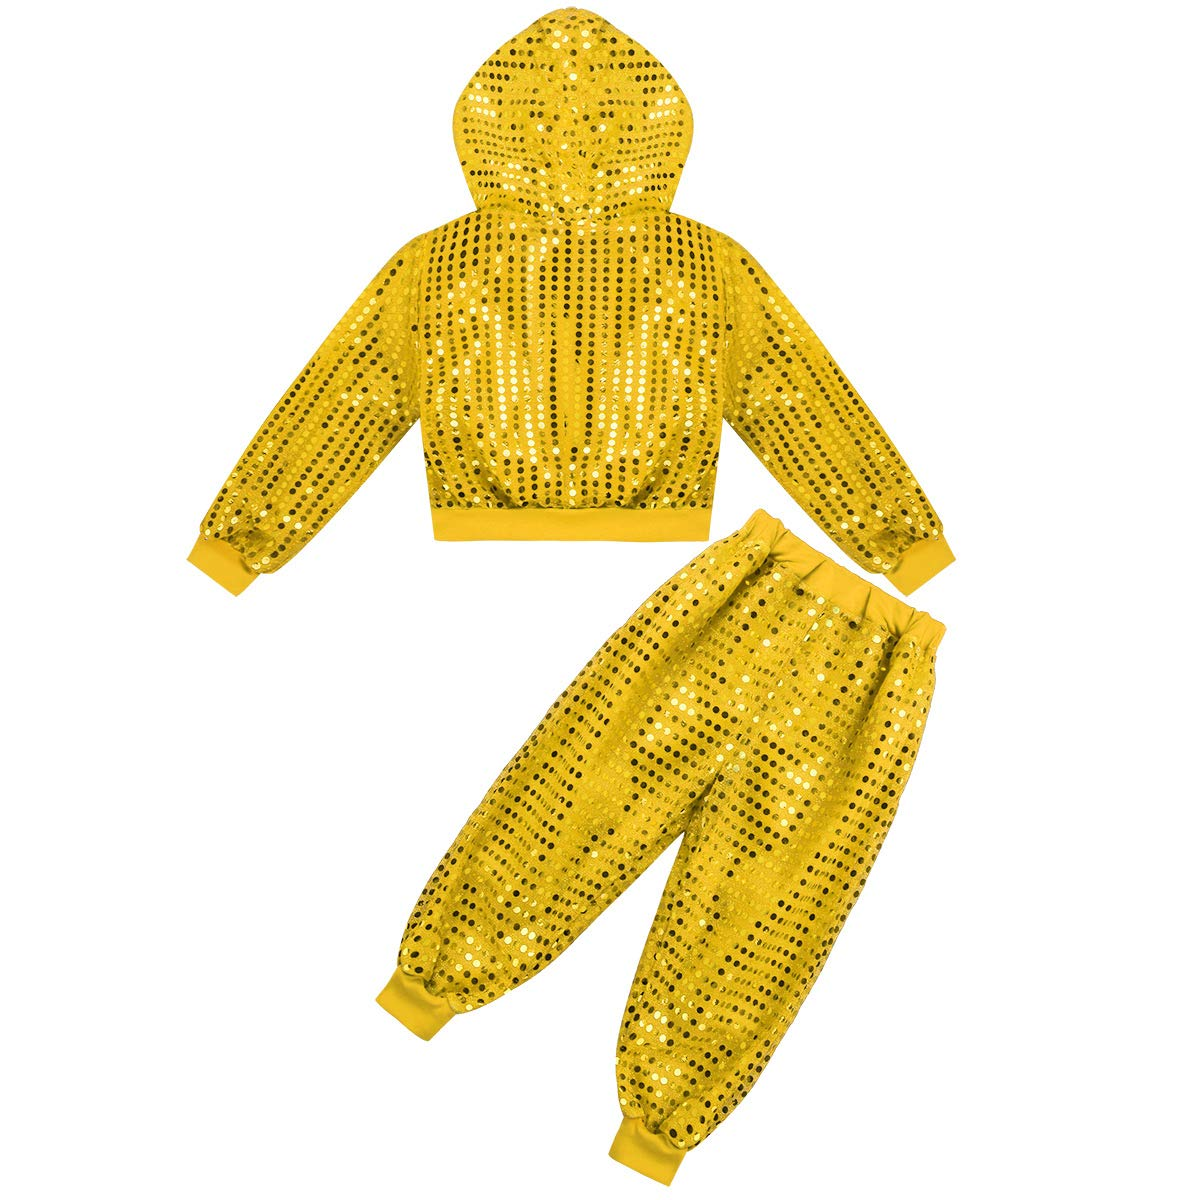 d9c22e0c3 ranrann Traje de Jazz Baile Callejero para Niño Niña Conjunto de Baile  Moderno Hip Hop Chaqueta con Lentejuelas + Pantalones Ropa de Rendimiento  Dancewear  ...